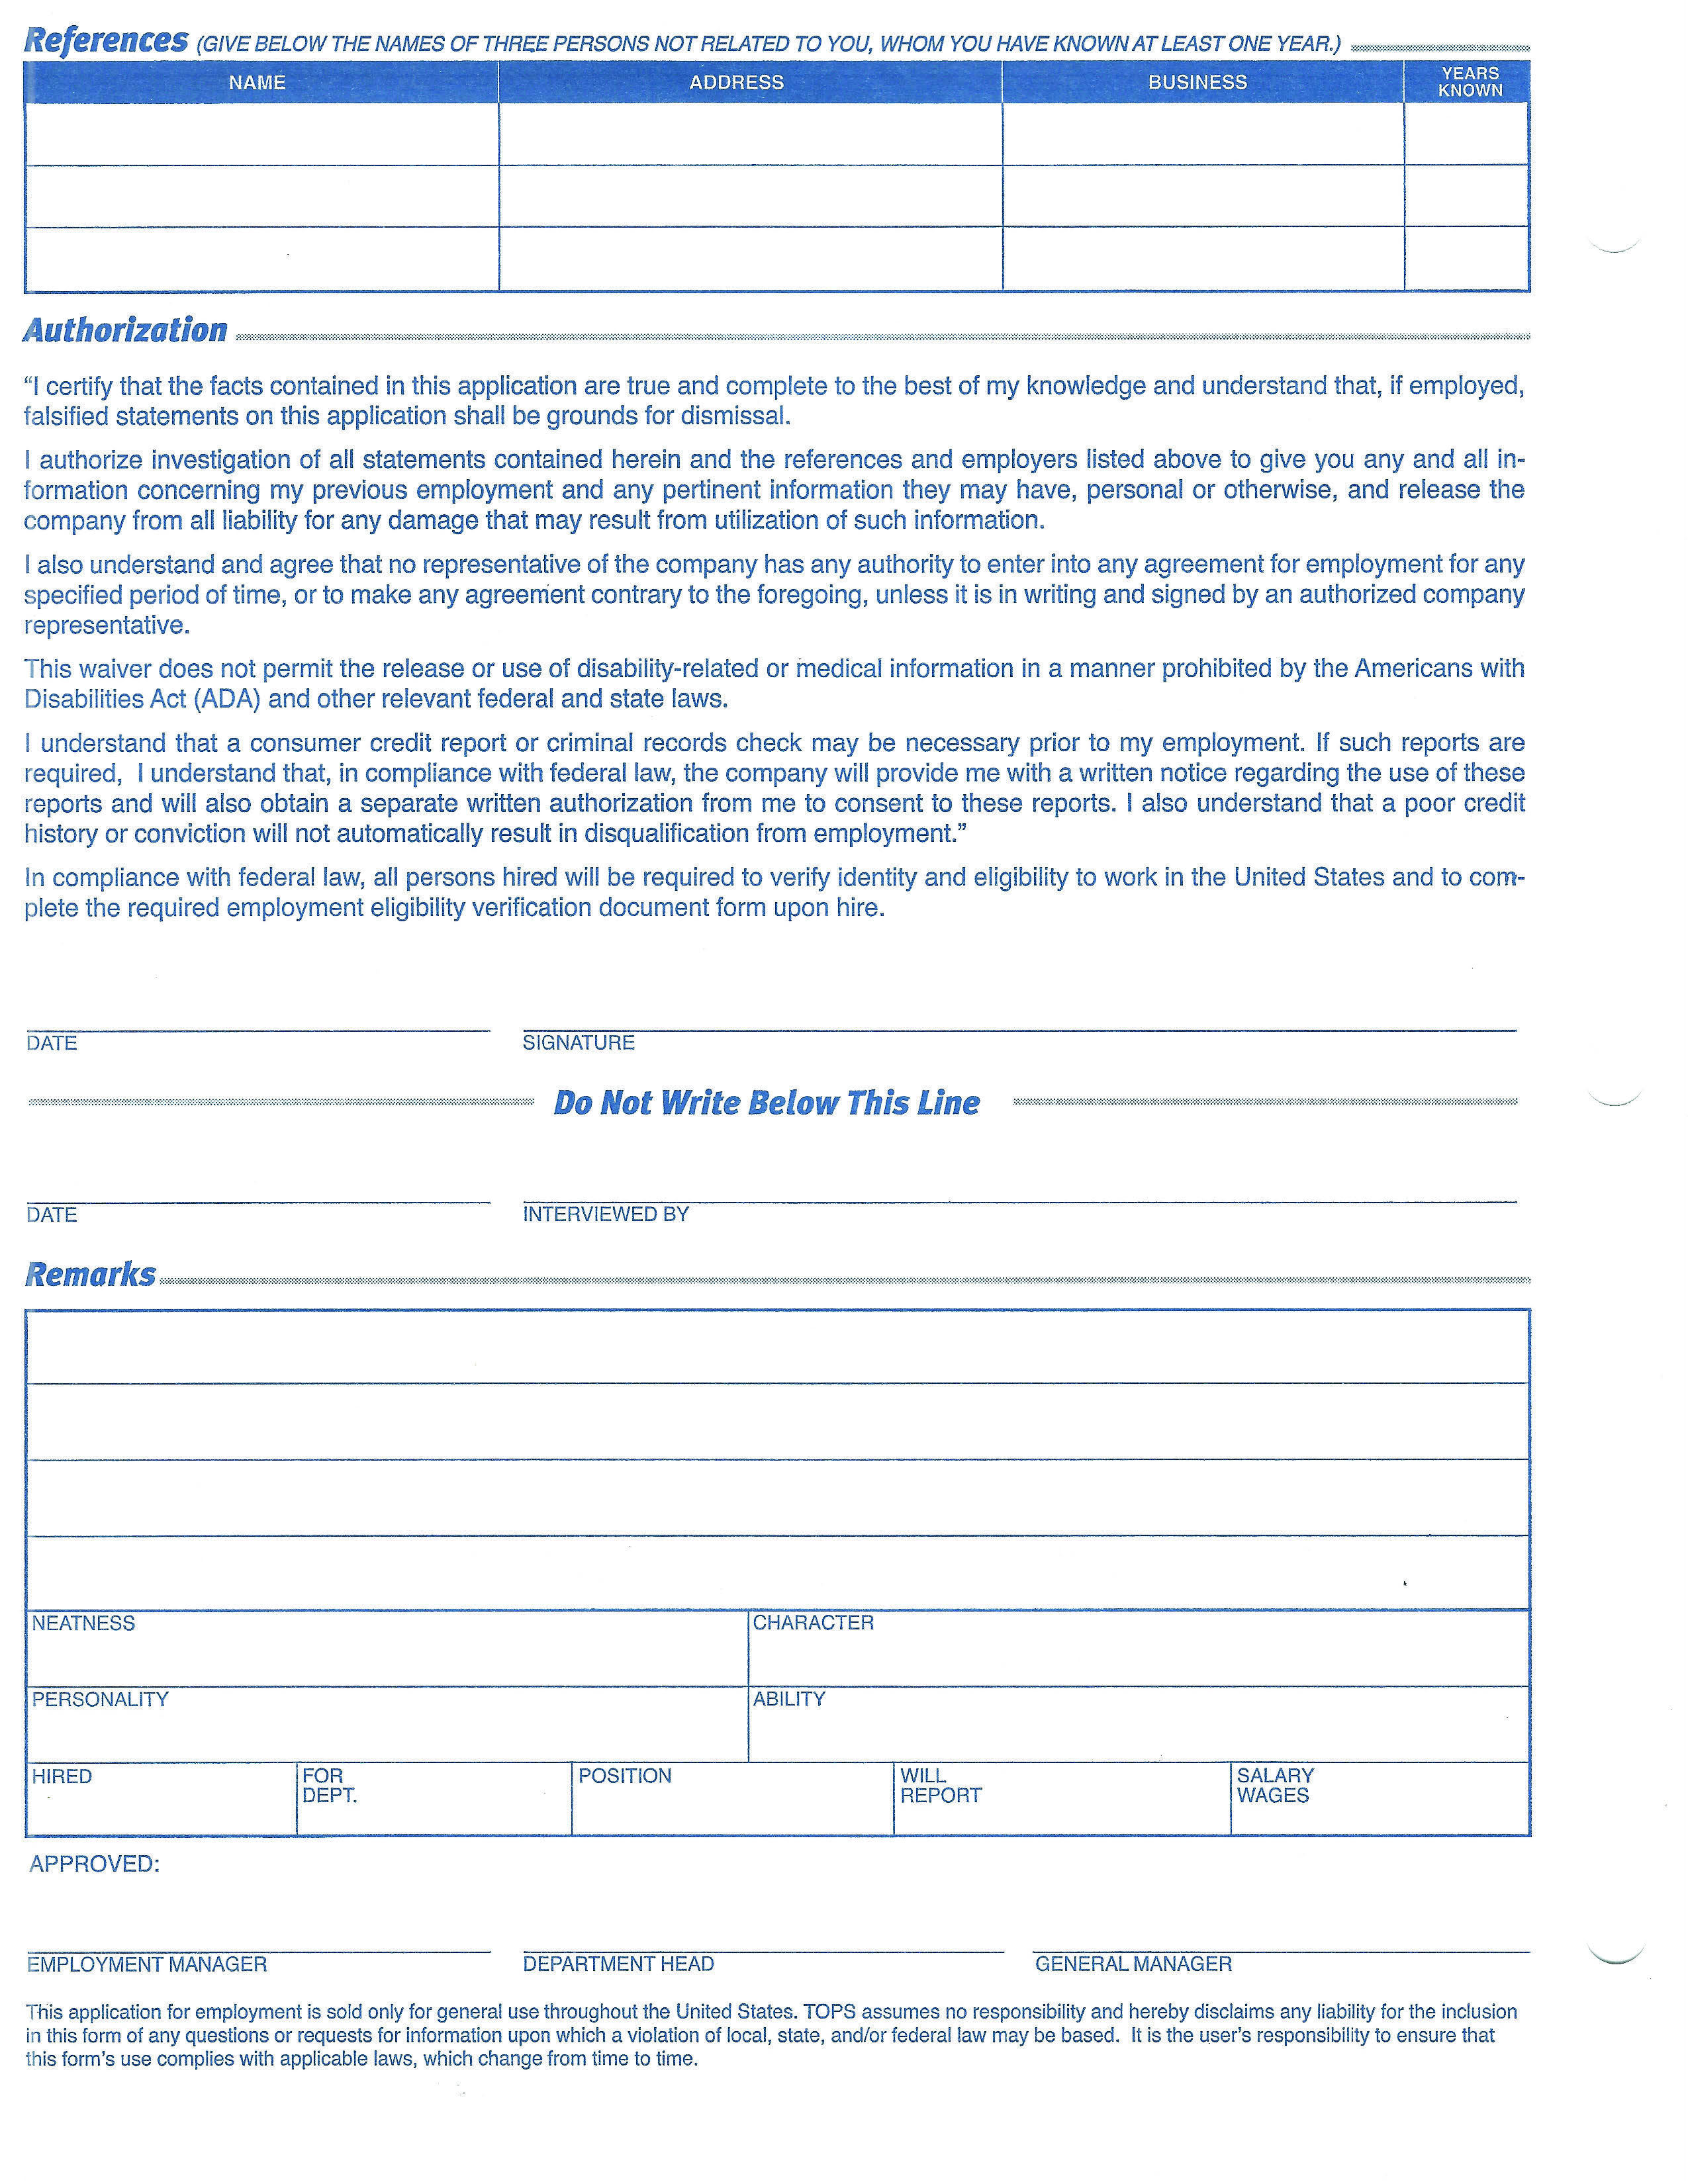 job-application2